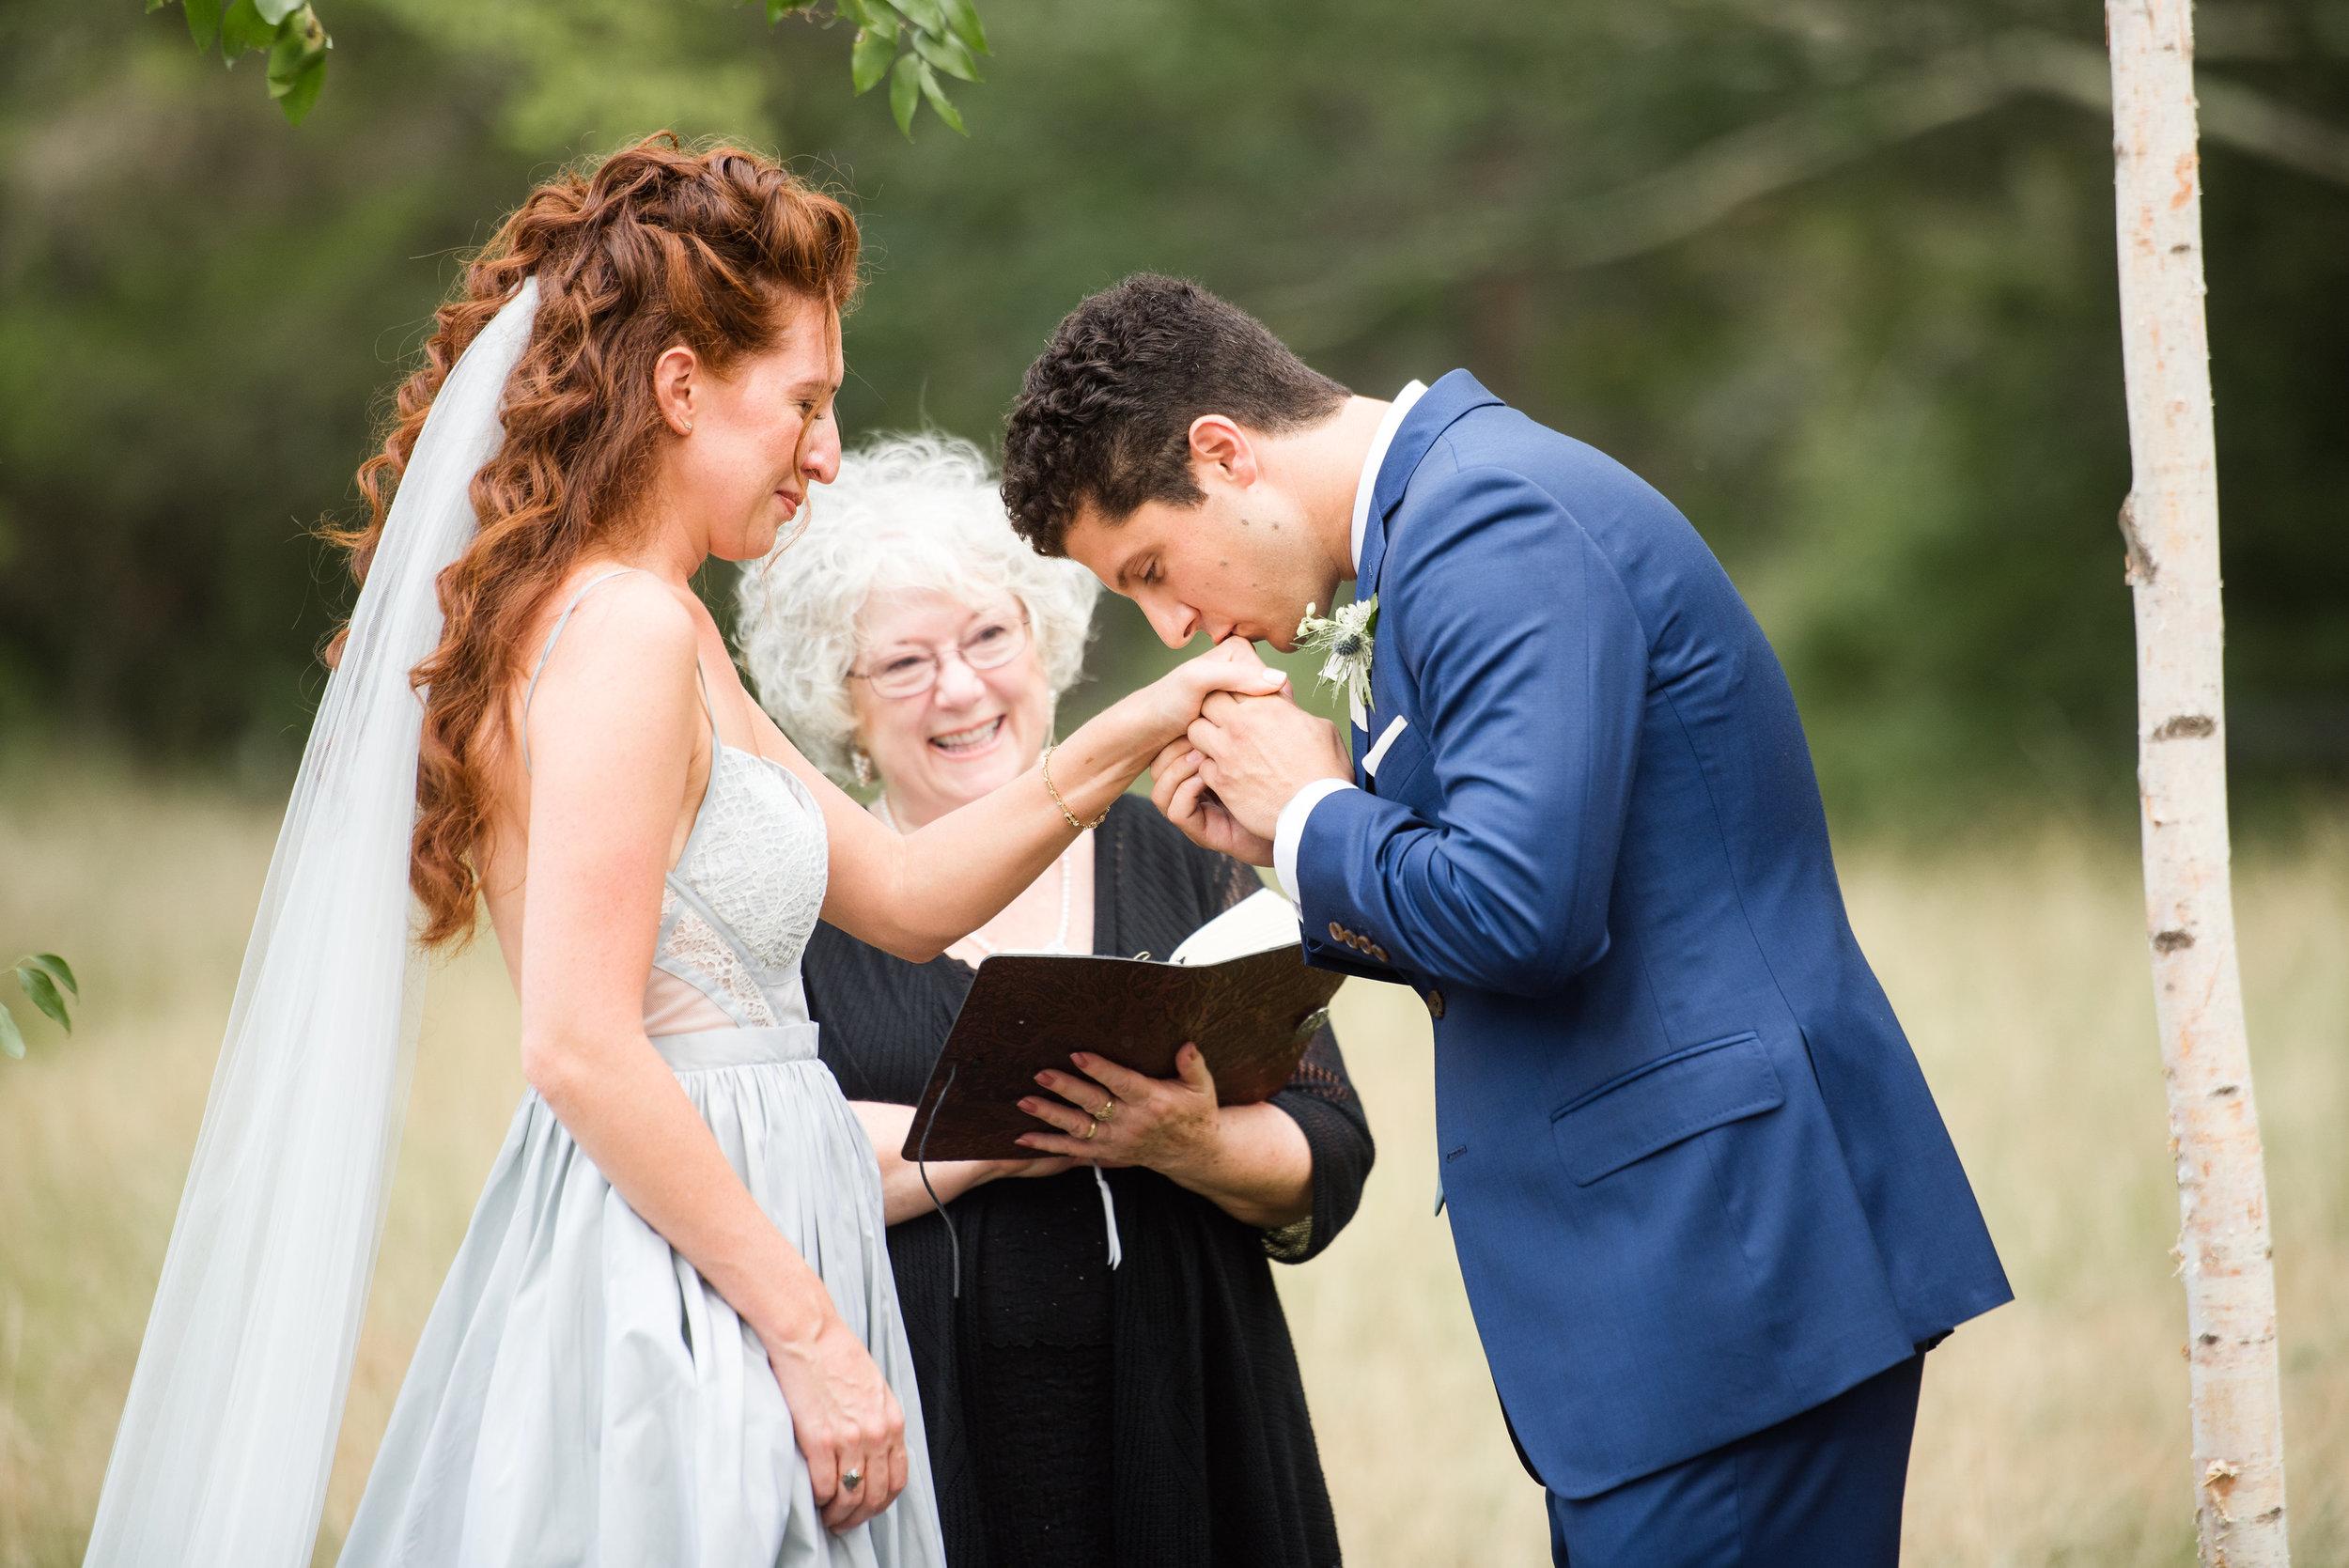 COPPER GEOMETRIC WEDDING LACE FACTORY WEDDING_011.jpg